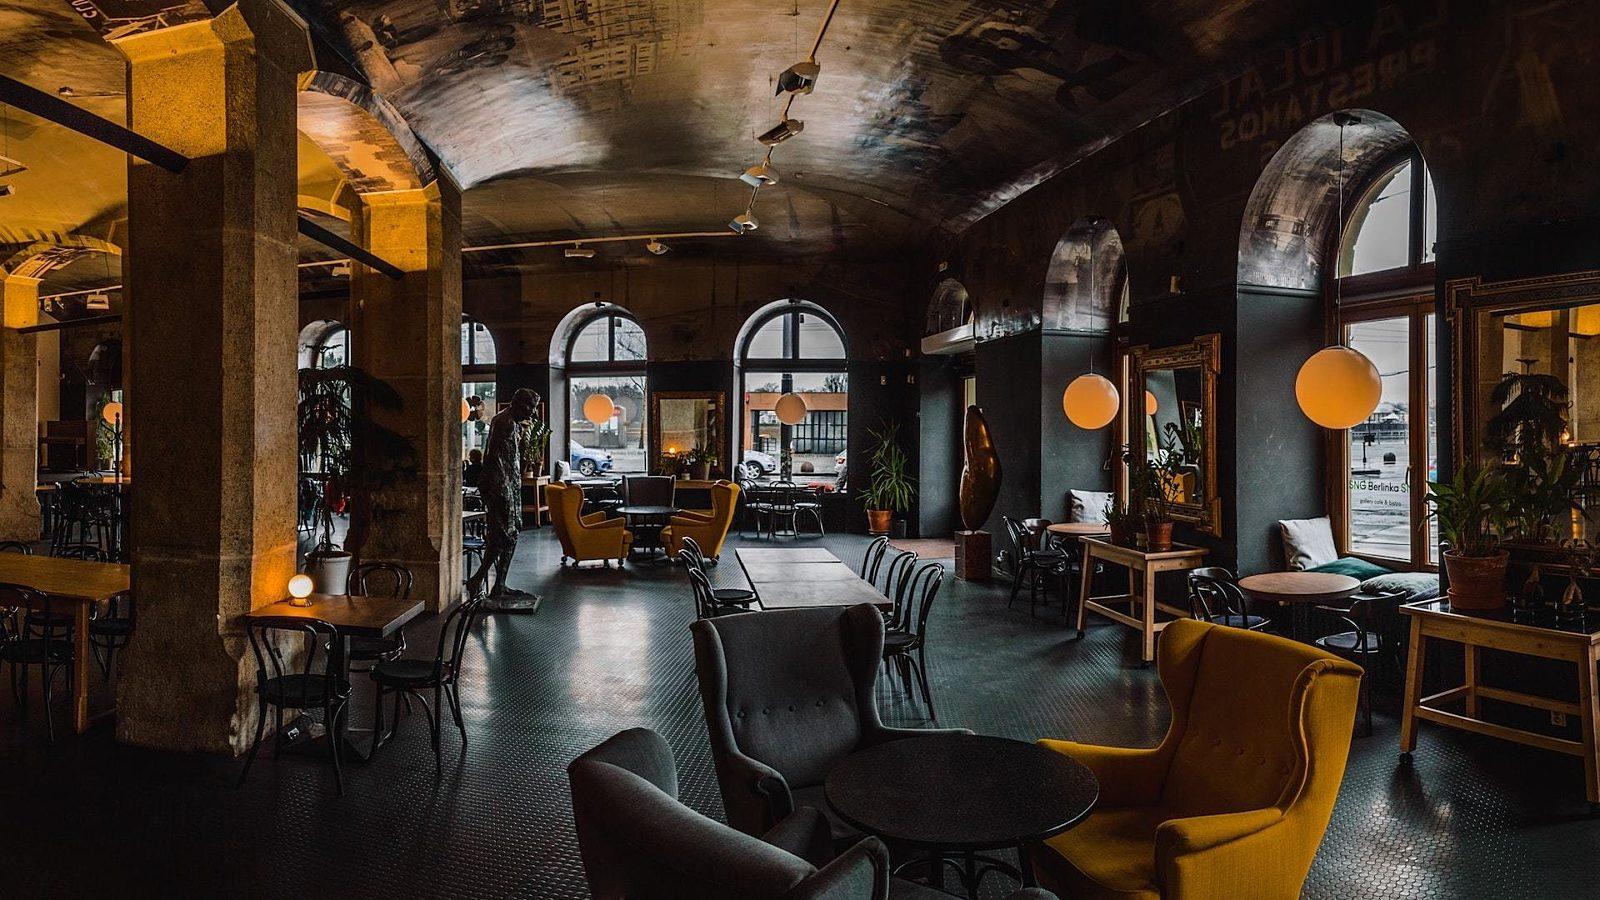 Emptyrestaurant loan